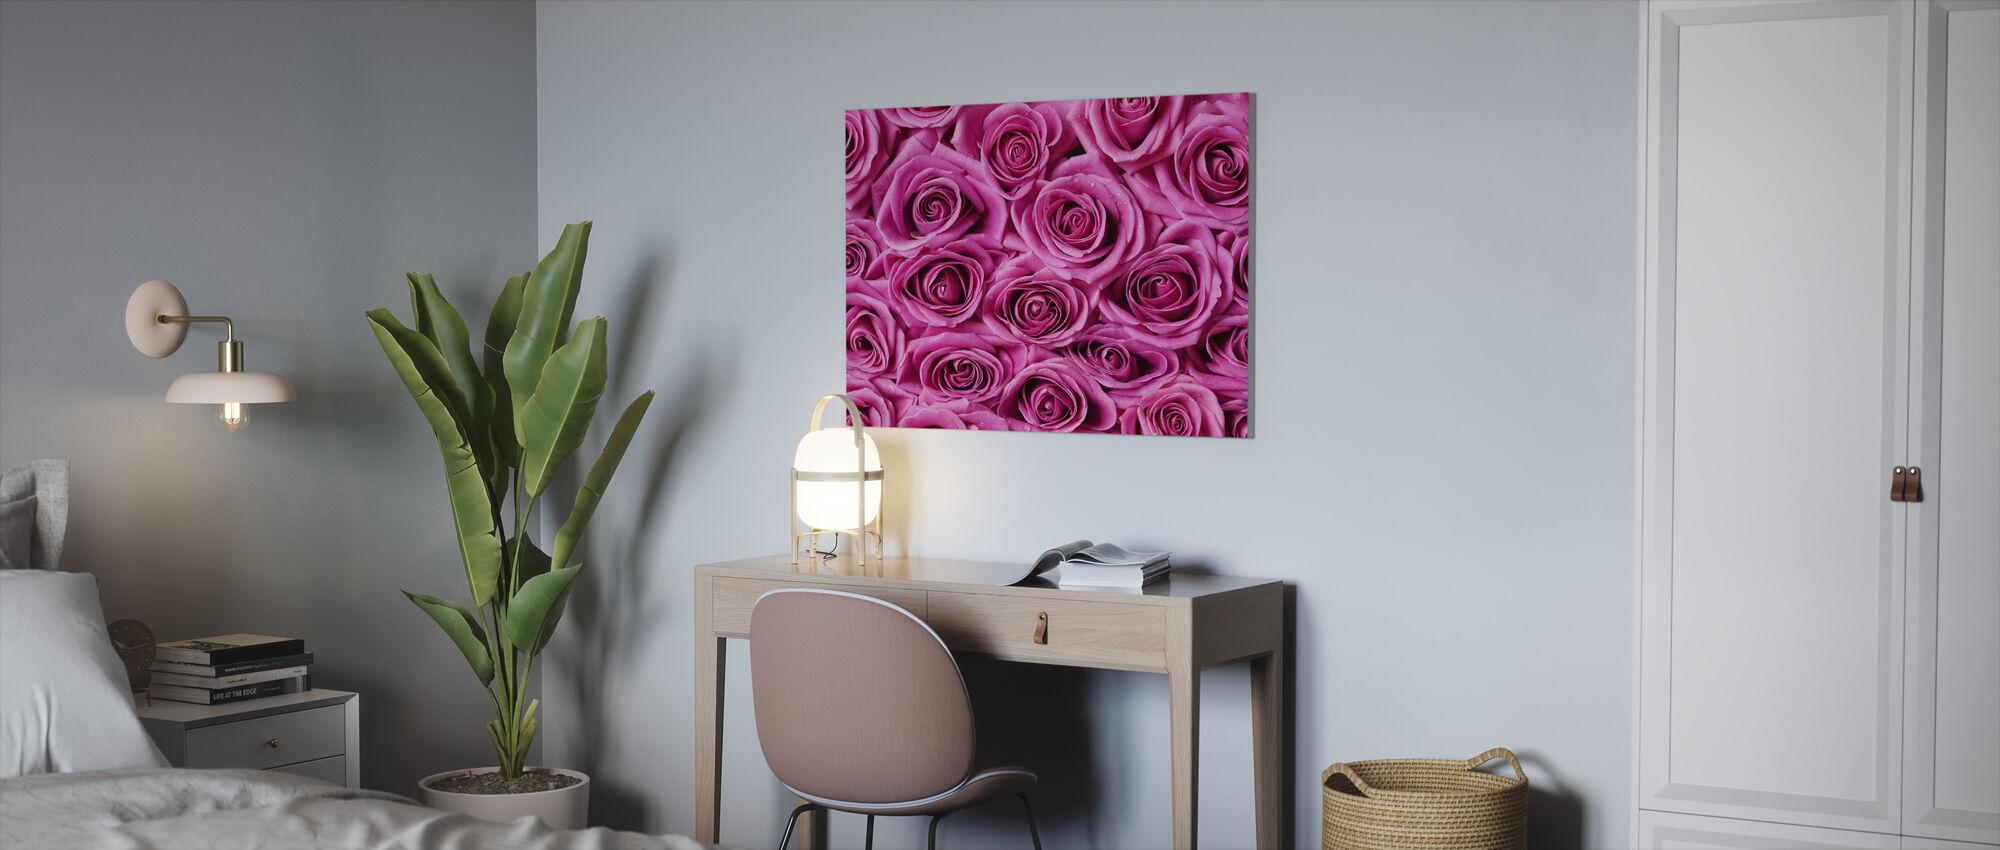 Roser og krysantemum - Lerretsbilde - Kontor